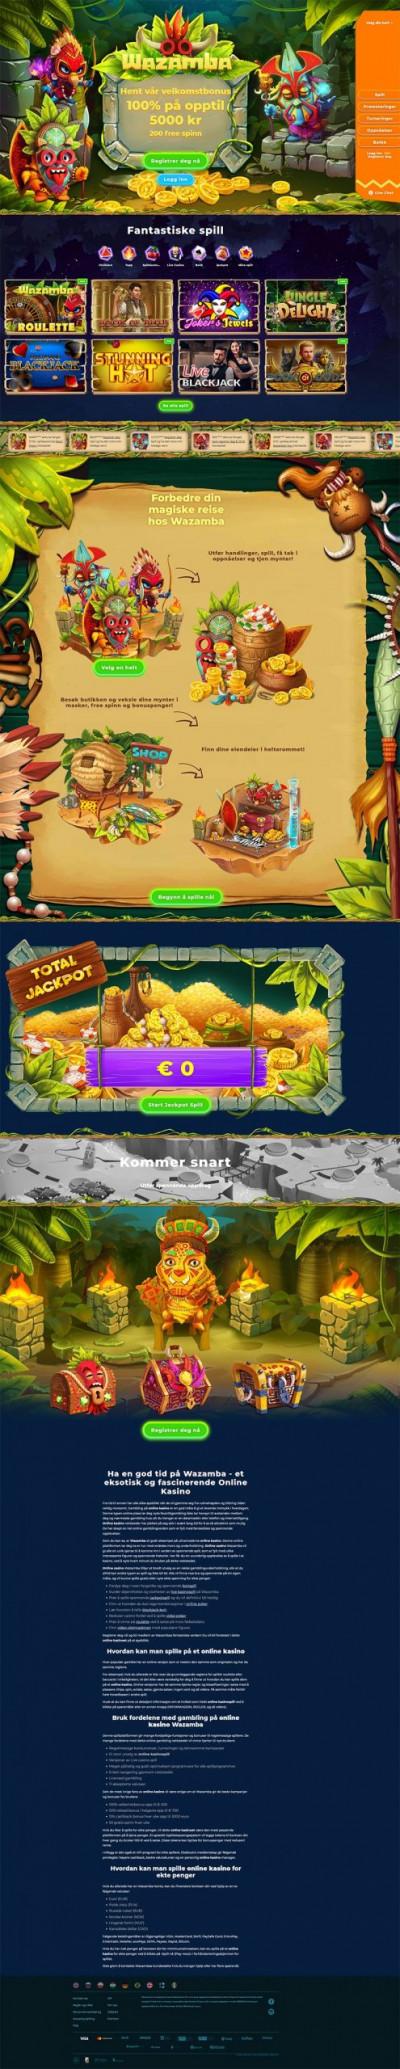 Wazamba Casino Screenshot